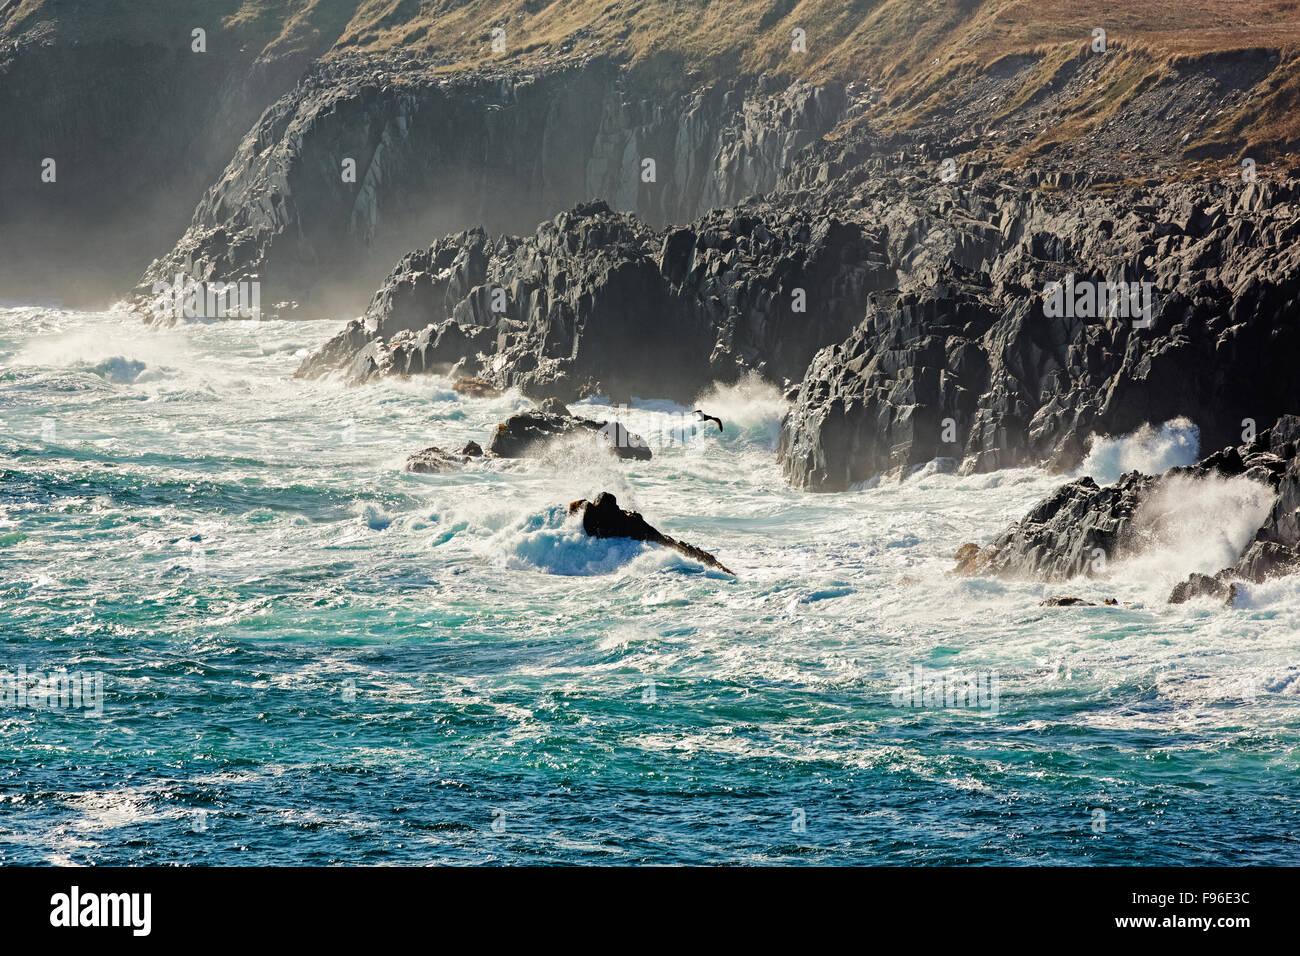 Waves breaking on coastline, Cape Race lighthouse National Historic Site, Newfoundland, Canada - Stock Image